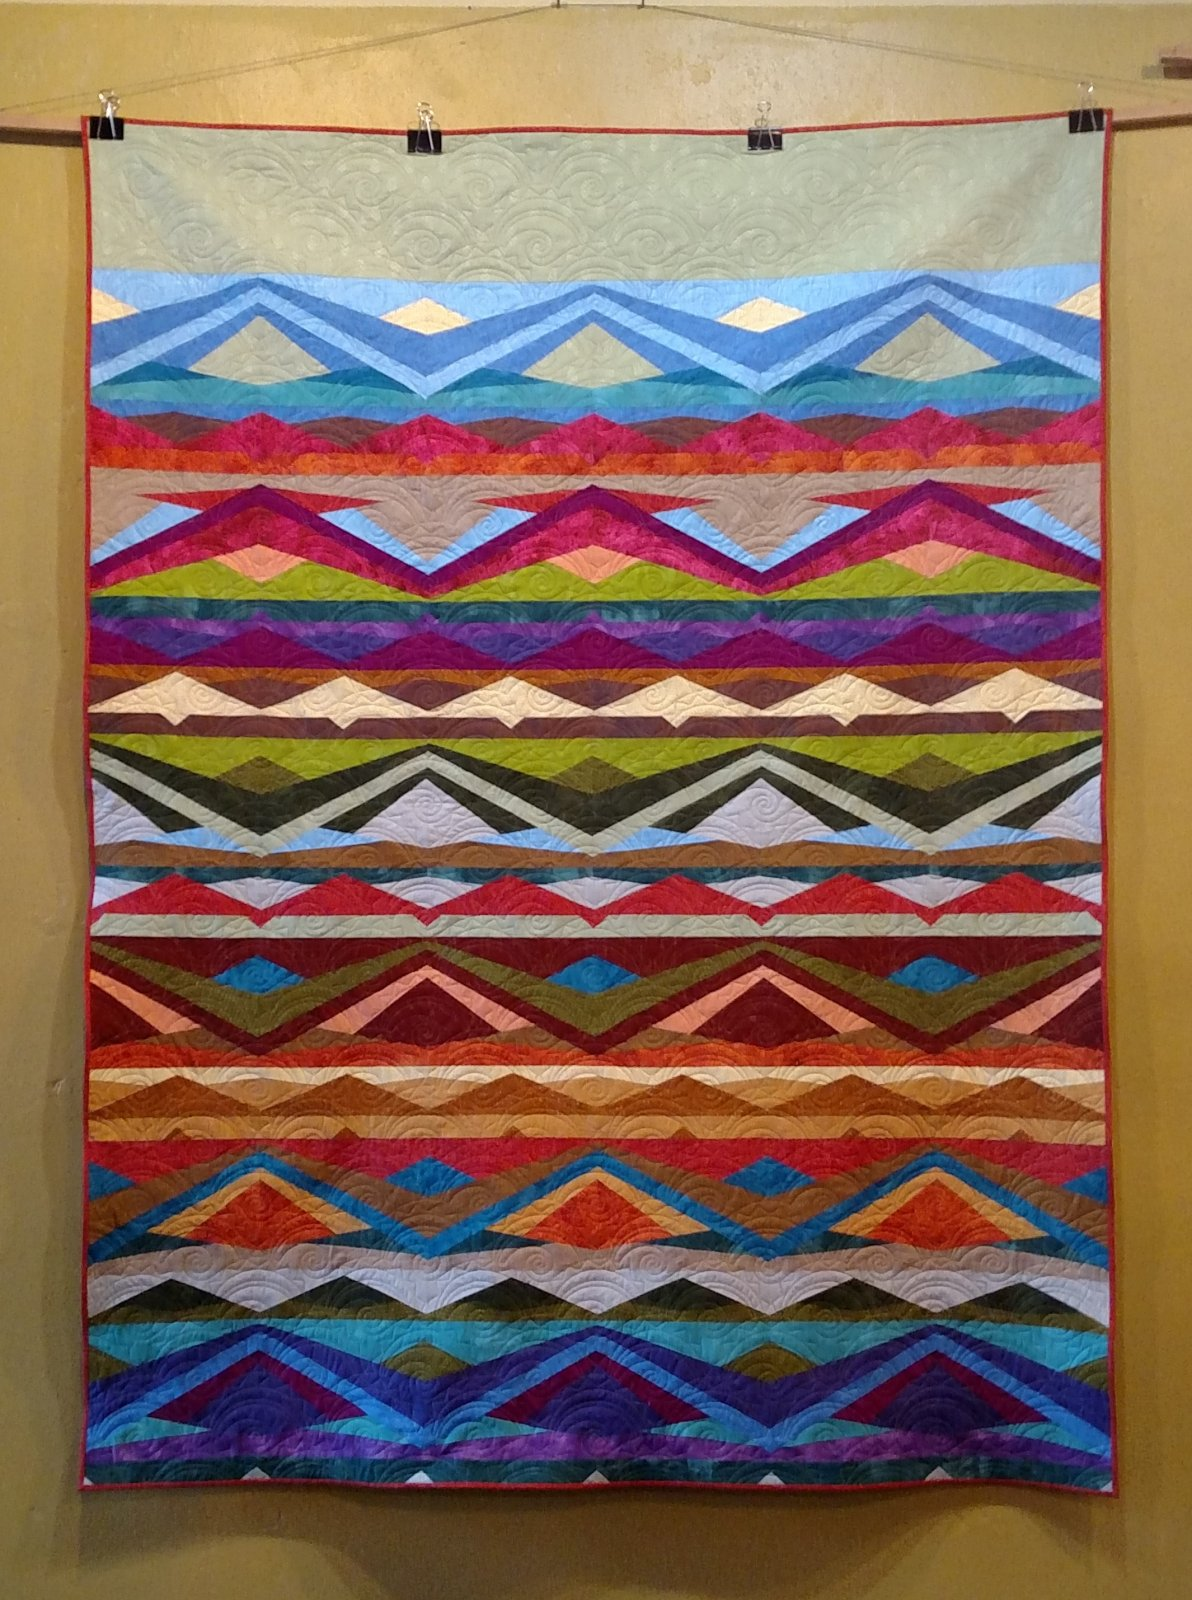 Russell quilt kit BASIC